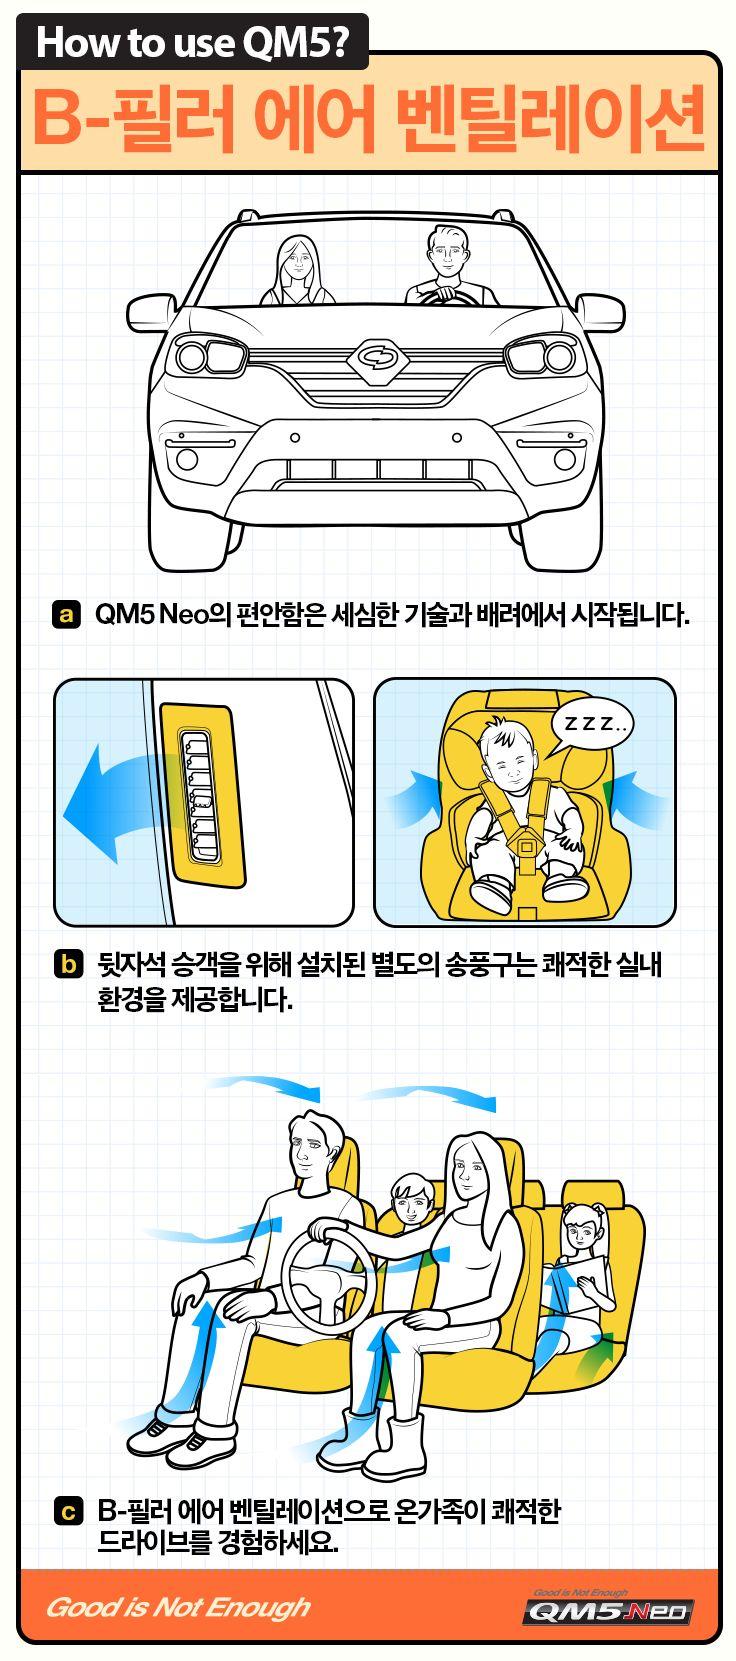 How to Use B-Pillar Air Ventilation _QM5 Neo